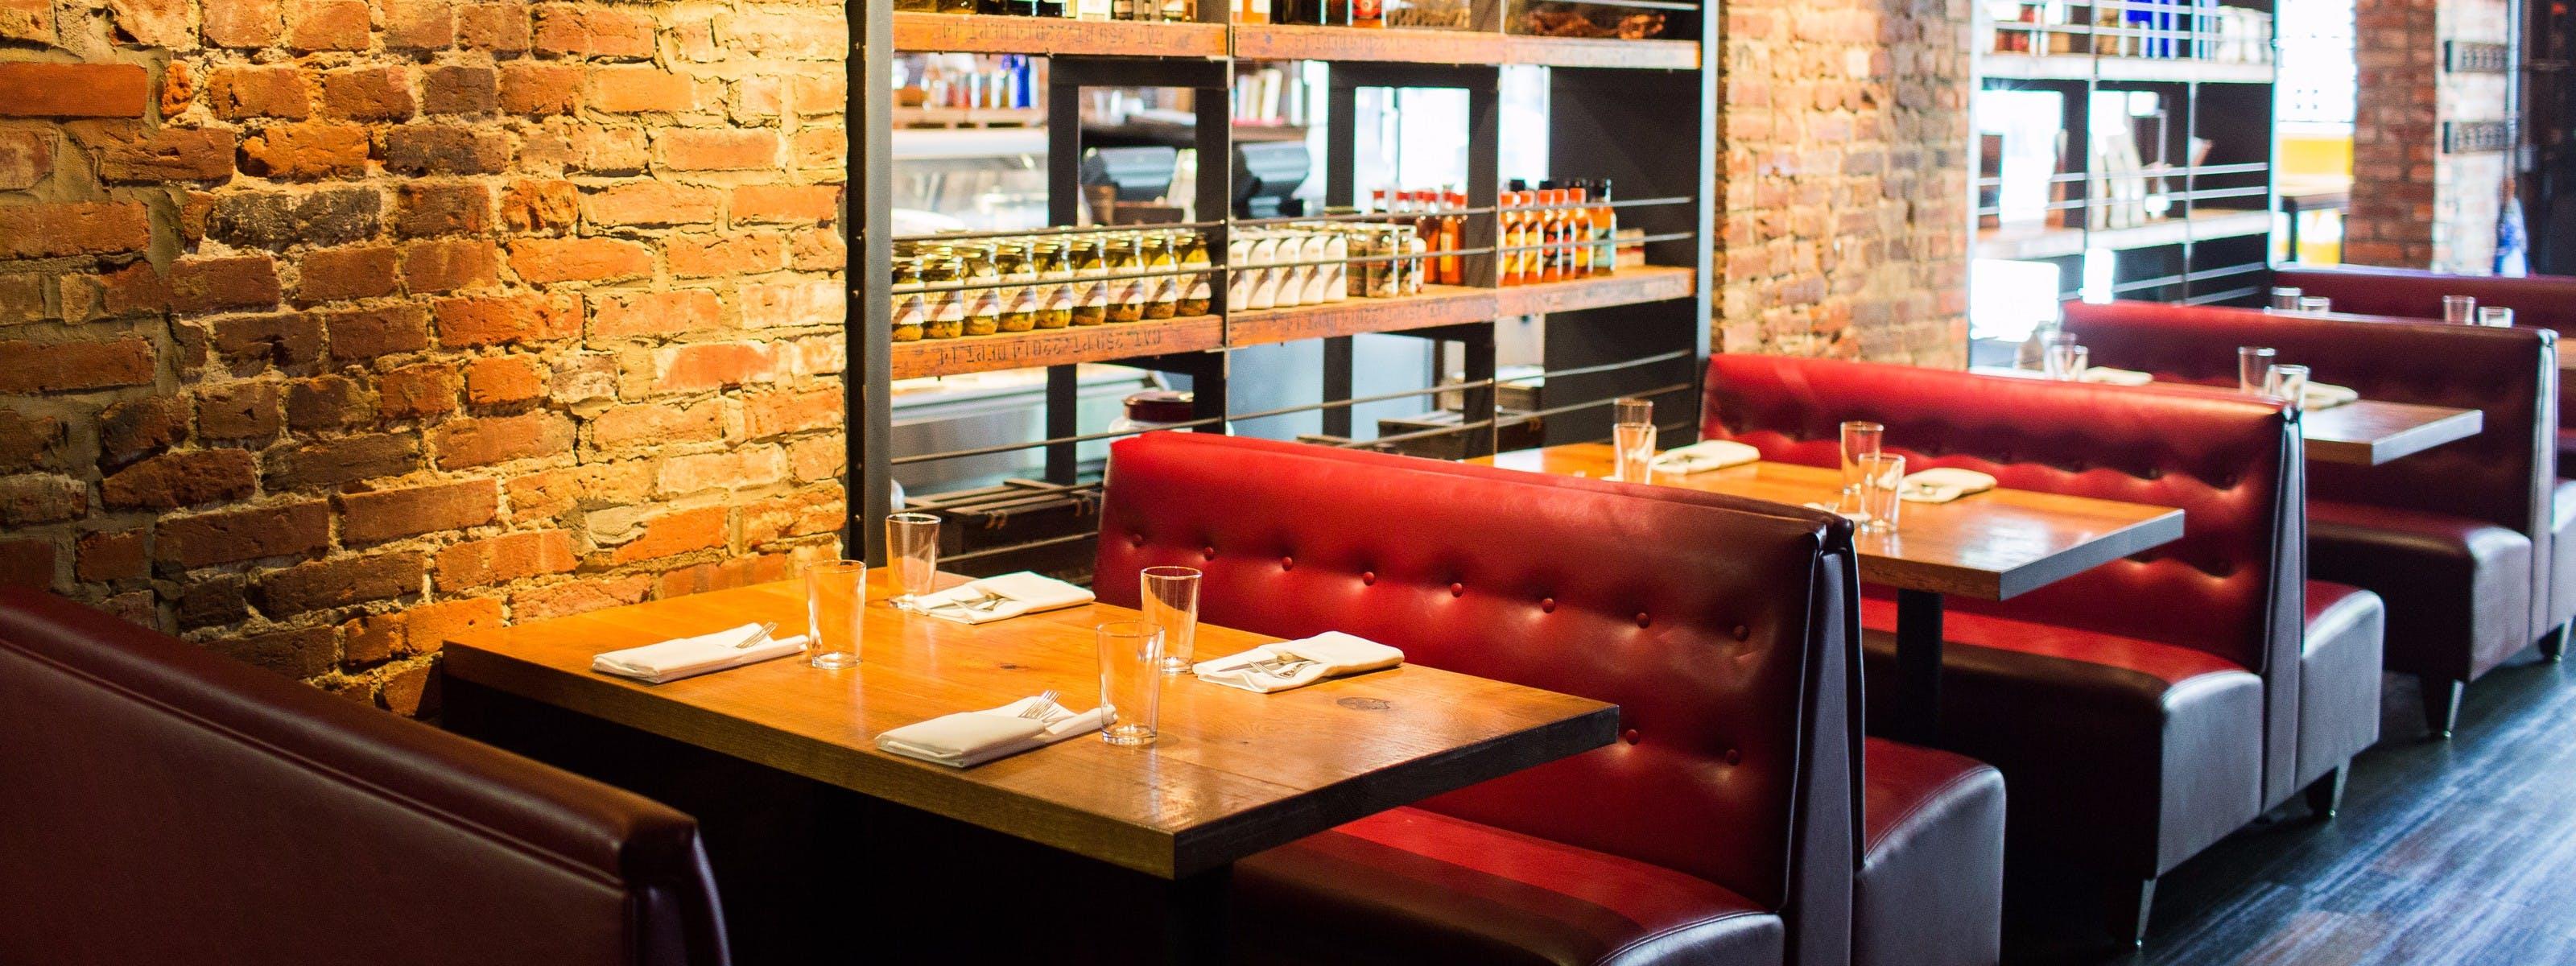 The Best DC Restaurants For Your Birthday Dinner - Washington DC - The Infatuation